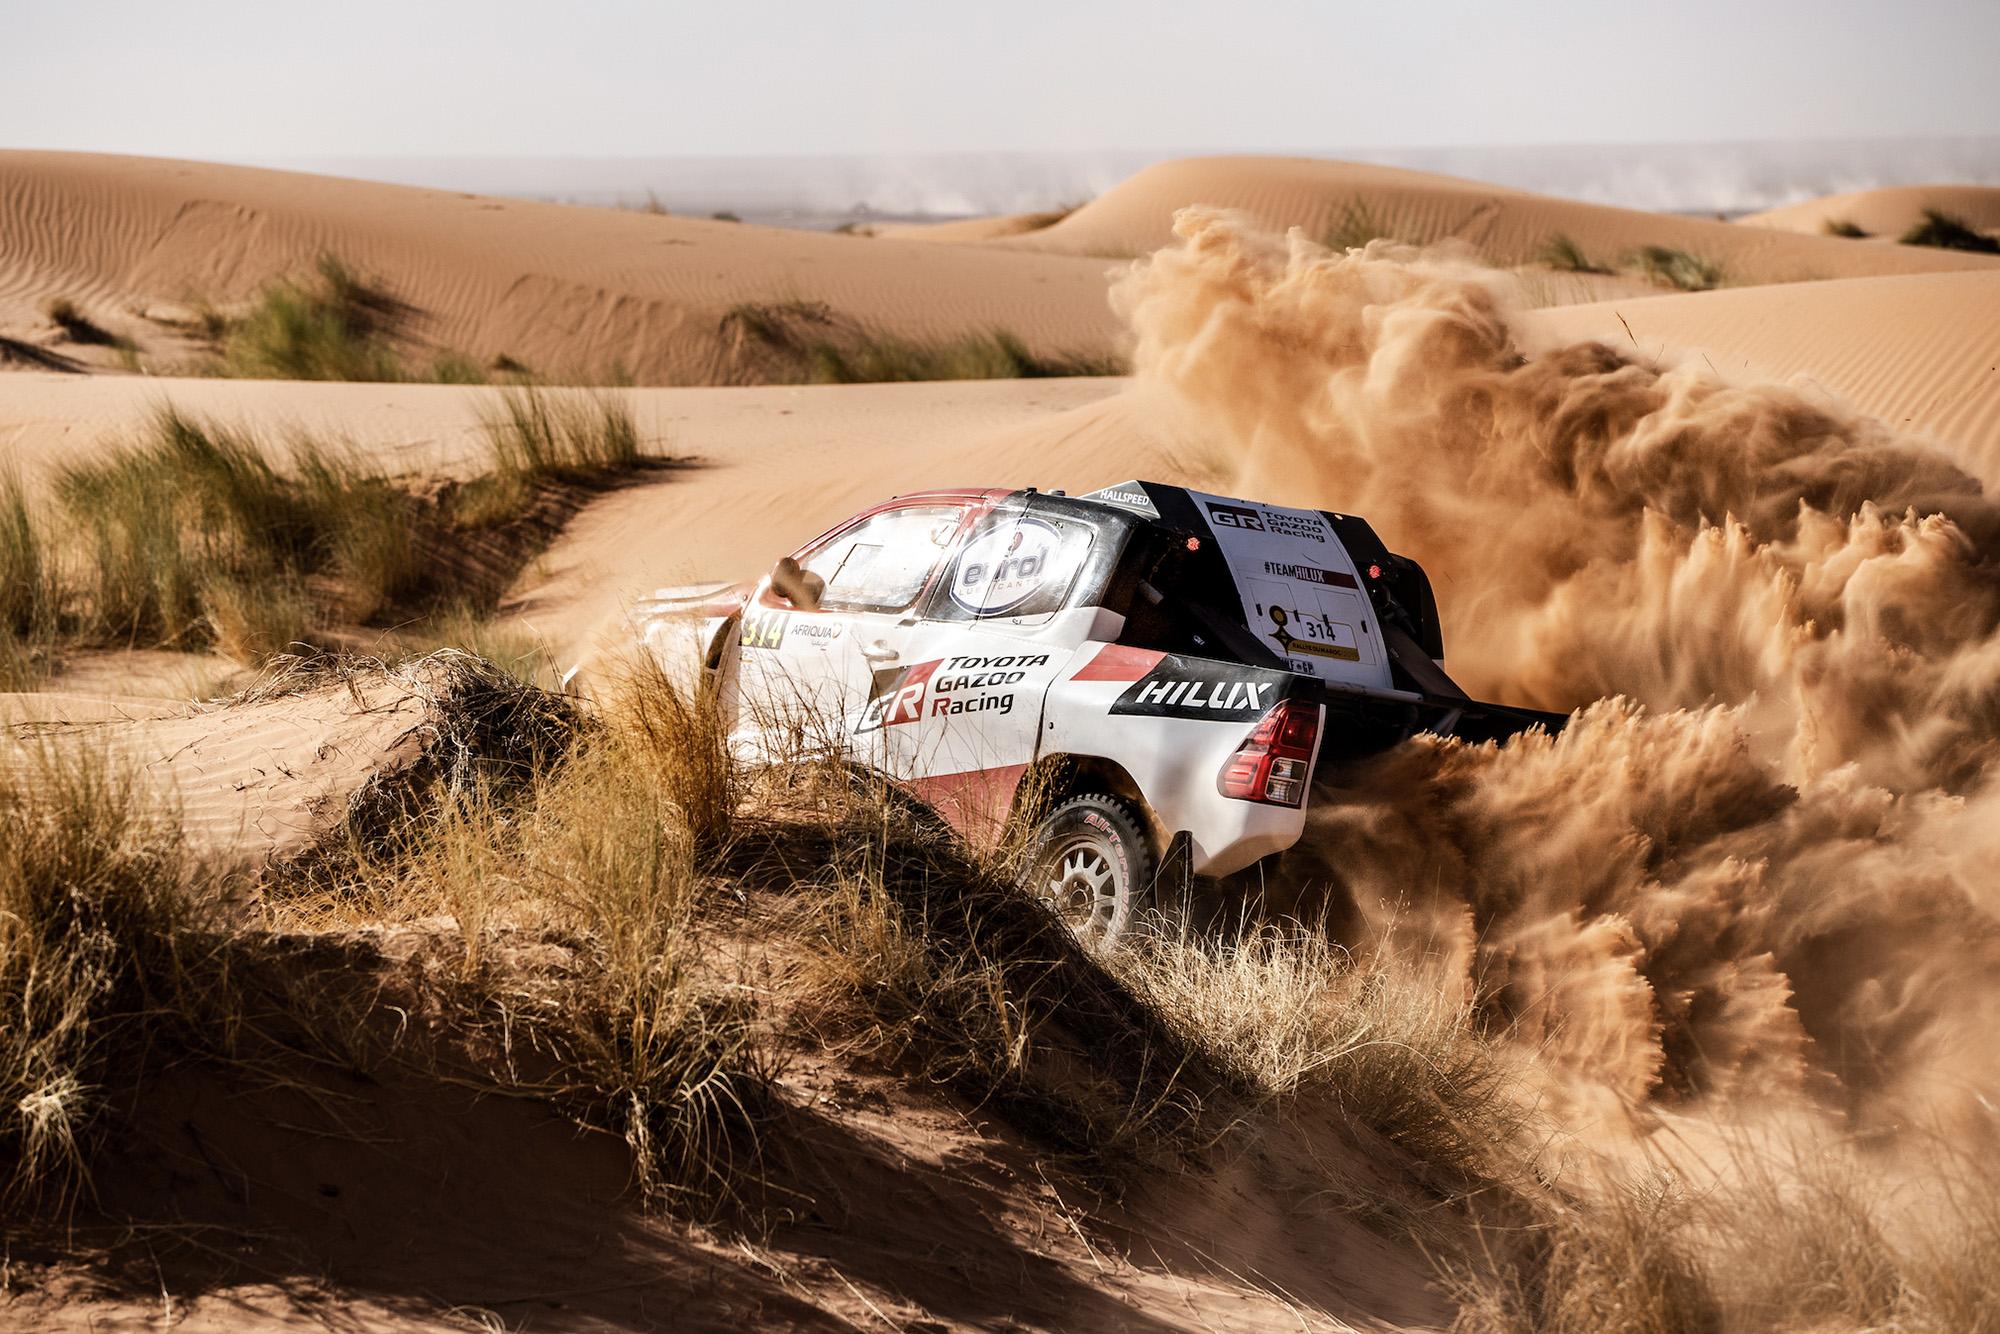 Fernando Alonso's Dakar-specification Toyota Hilux churning up sand during testing